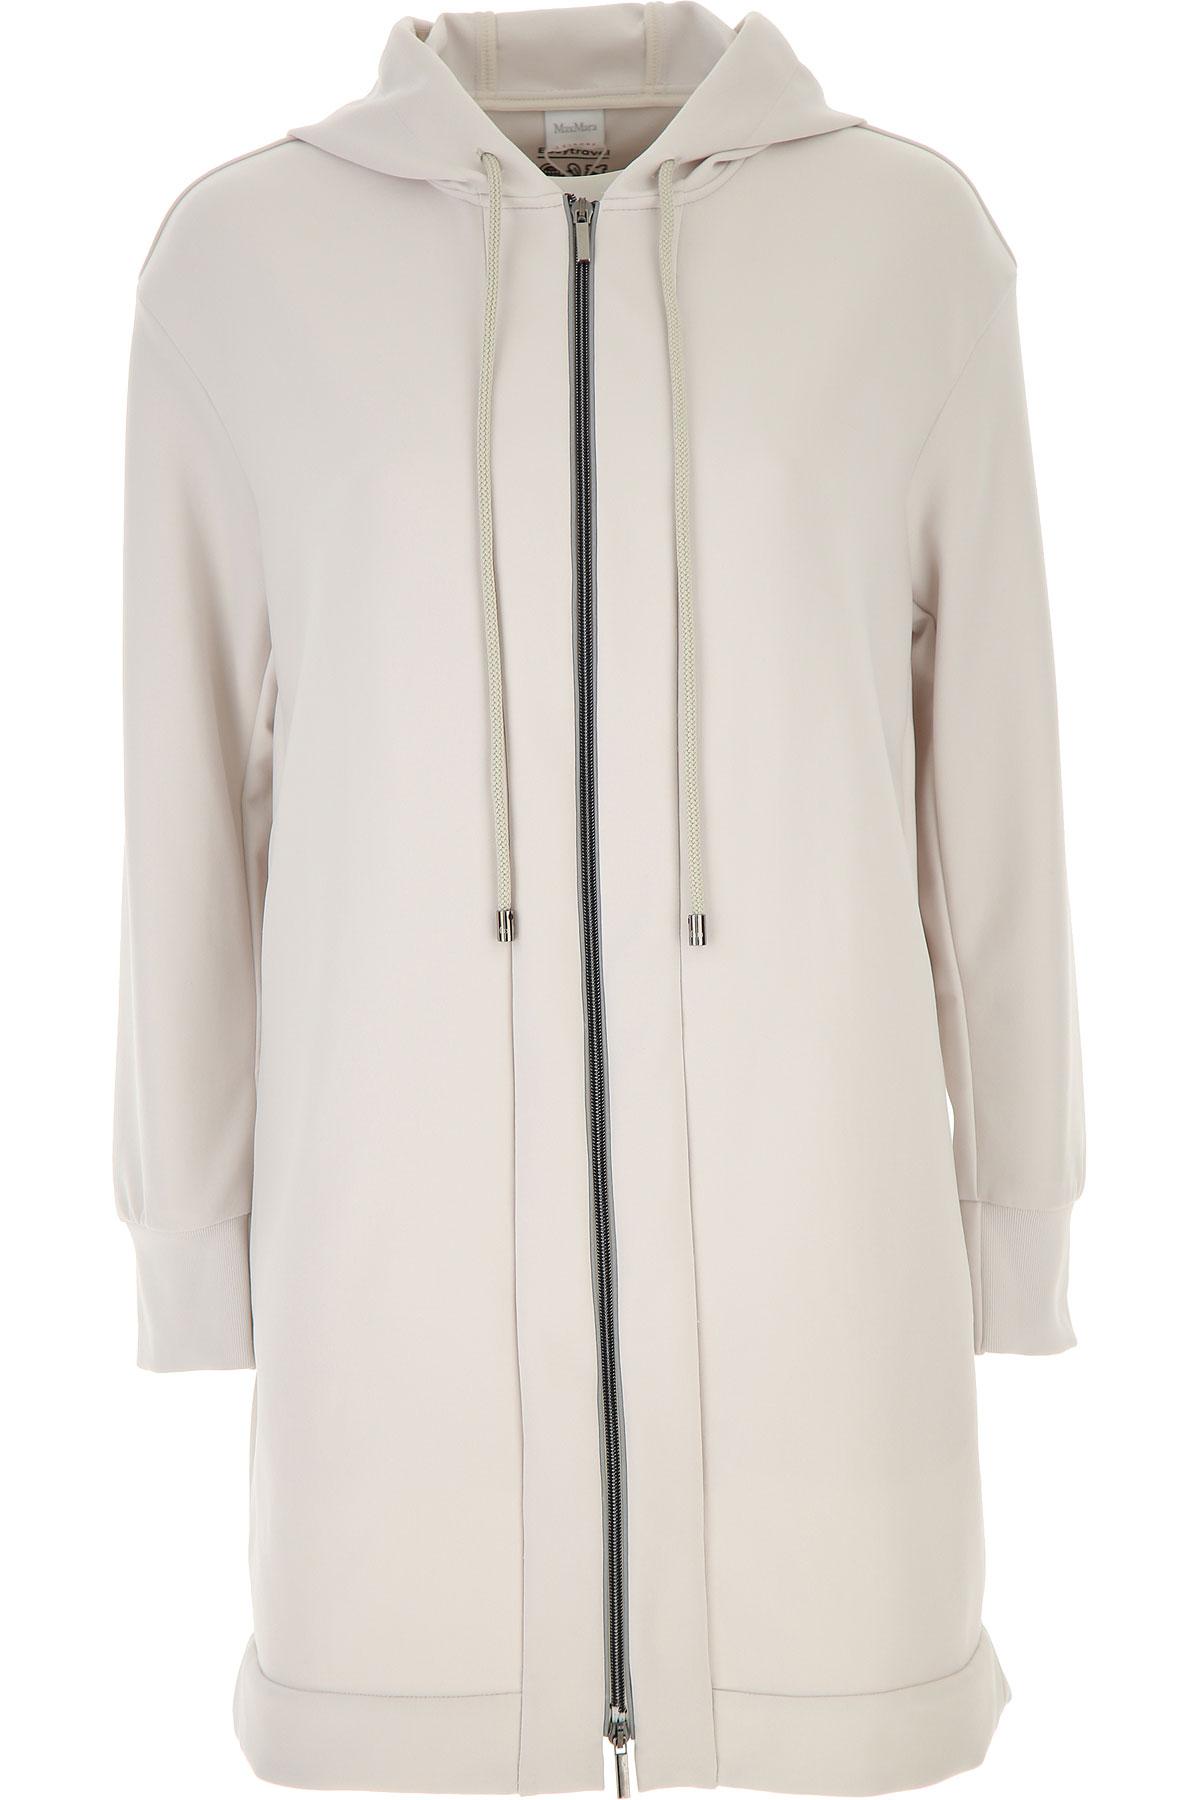 Max Mara Jacket for Women On Sale, Chalk, polyamide, 2019, 4 8